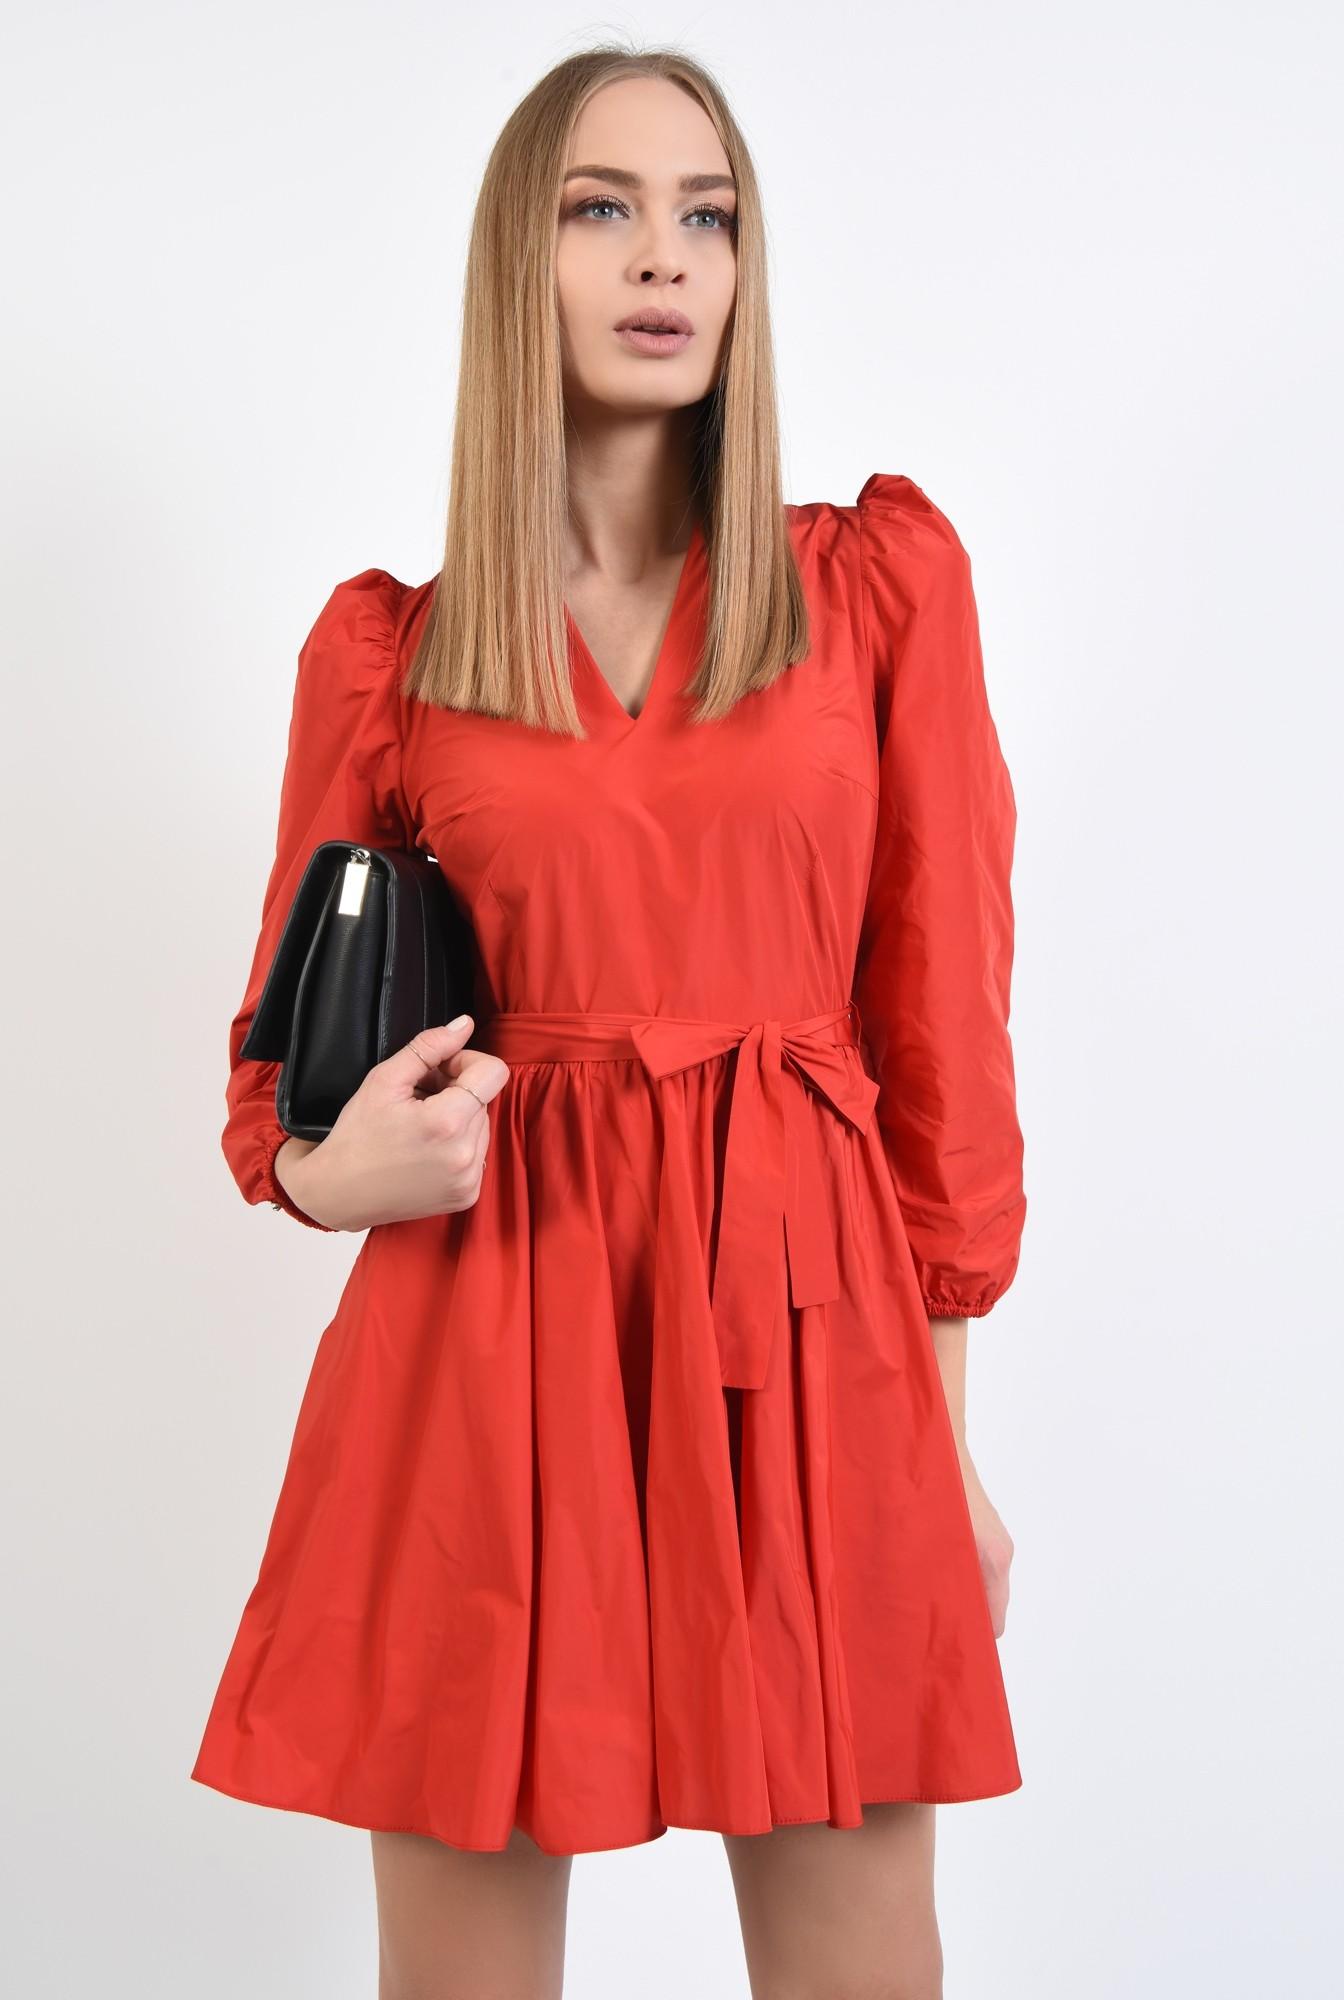 2 - 360 - rochie de zi, rosie, aspect sifonat, croi clos